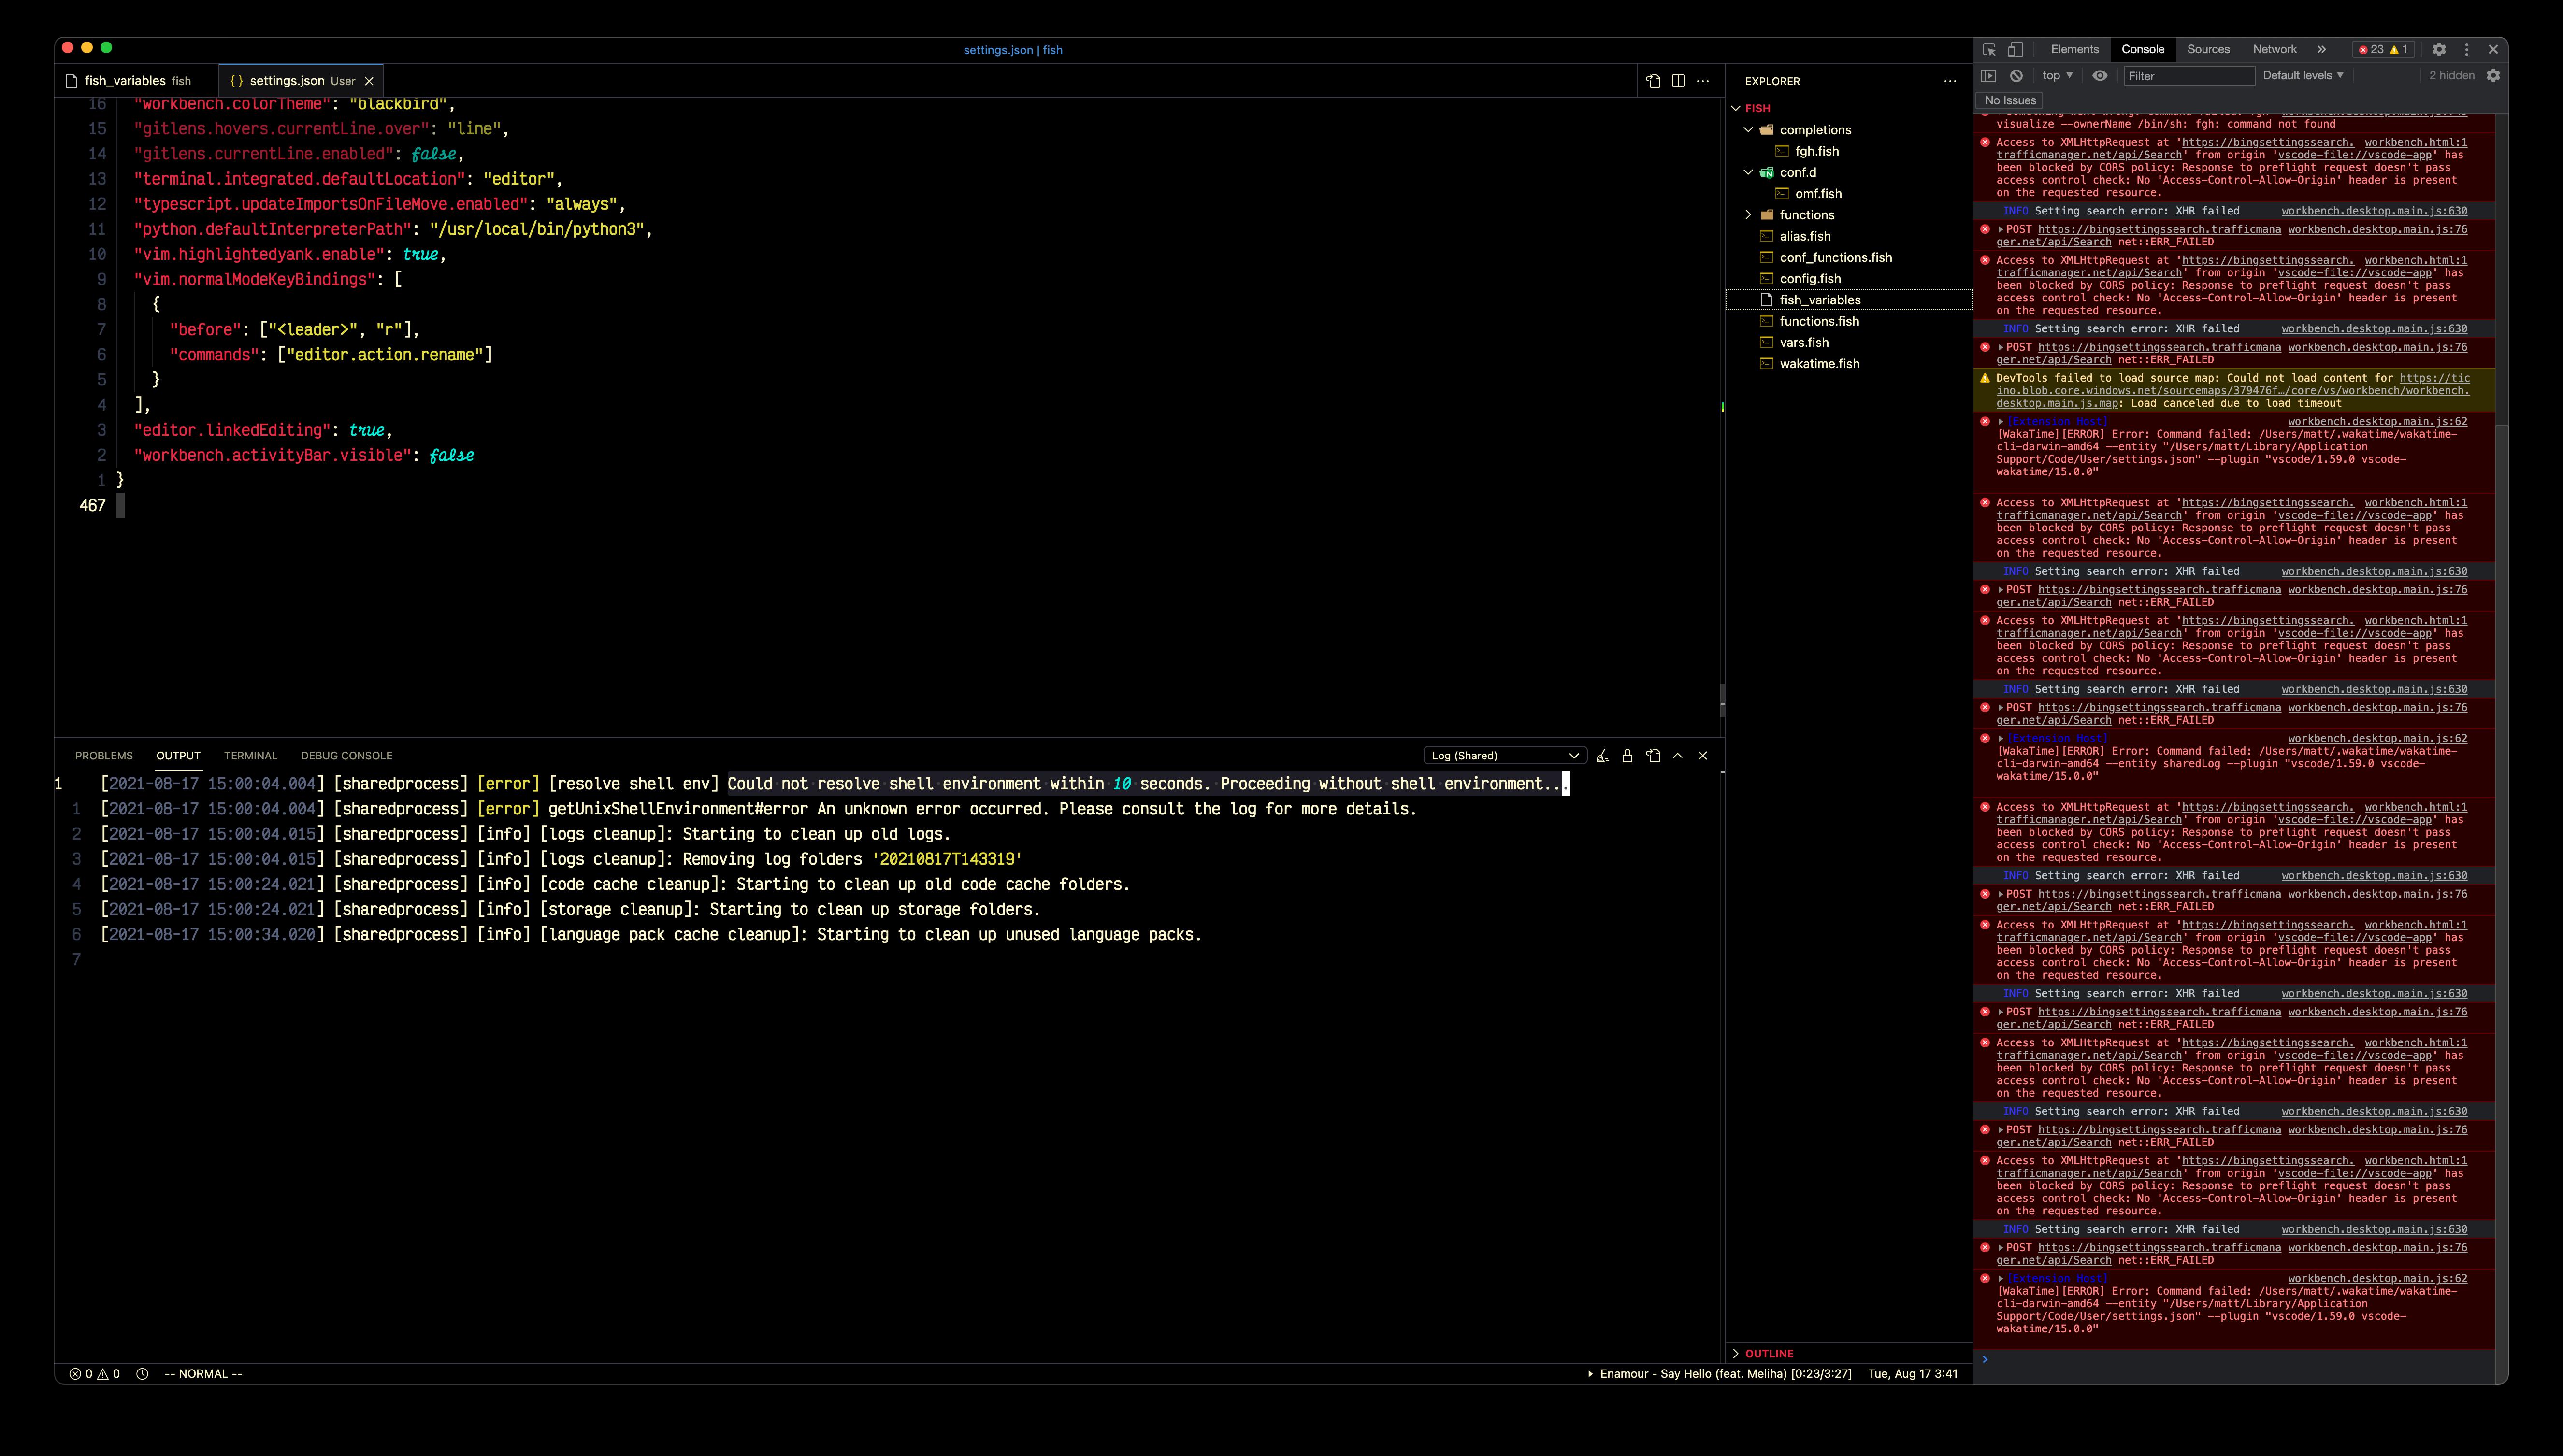 https://cloud-n3ltdqdz9-hack-club-bot.vercel.app/0screen_shot_2021-08-17_at_3.41.33_pm.png